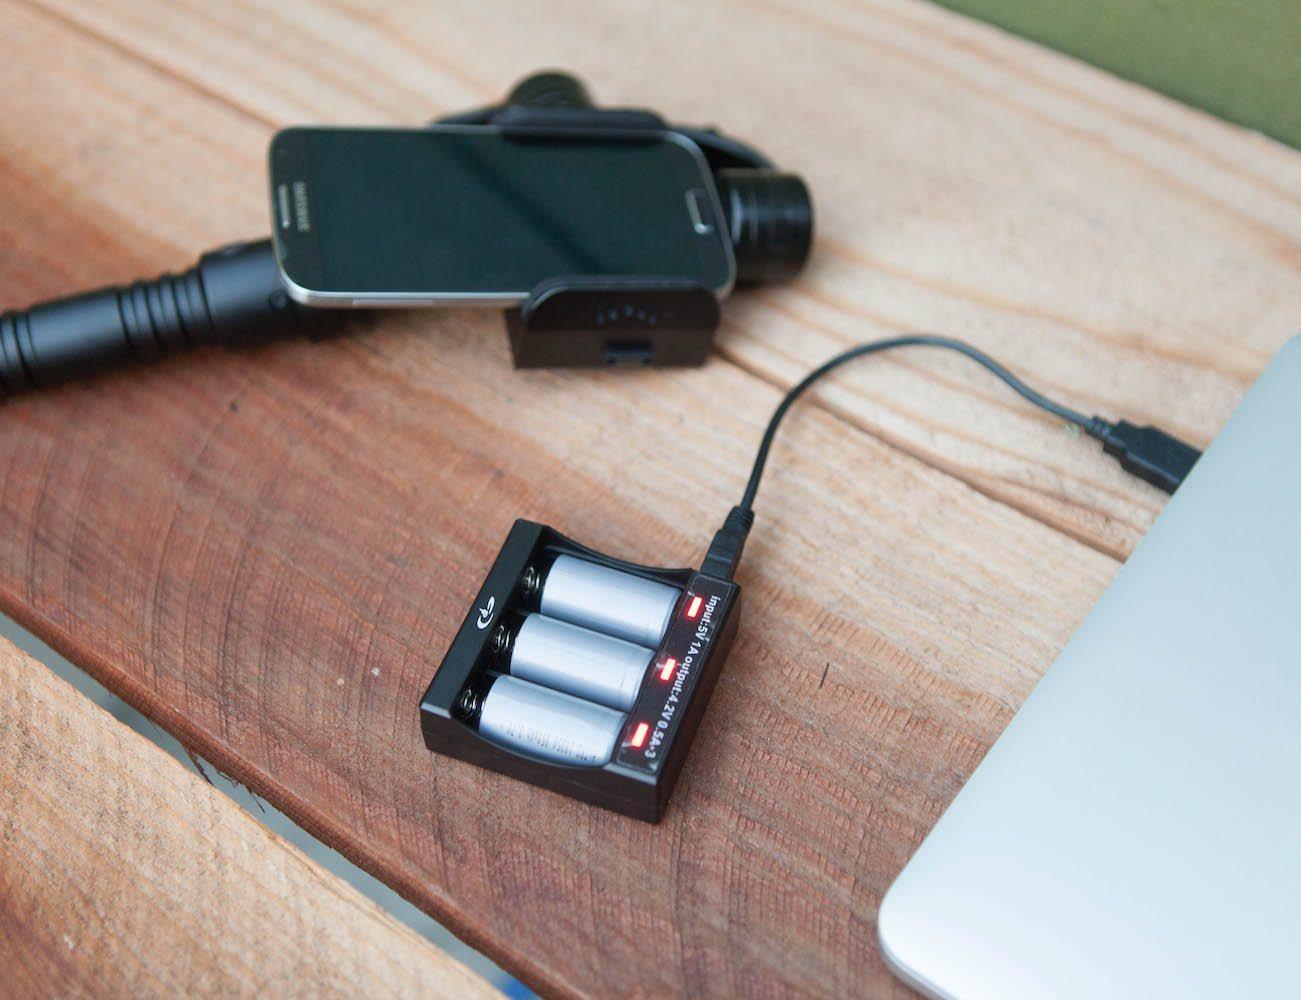 Fly-X3 – The Handy Motorized Phone Stabilizer